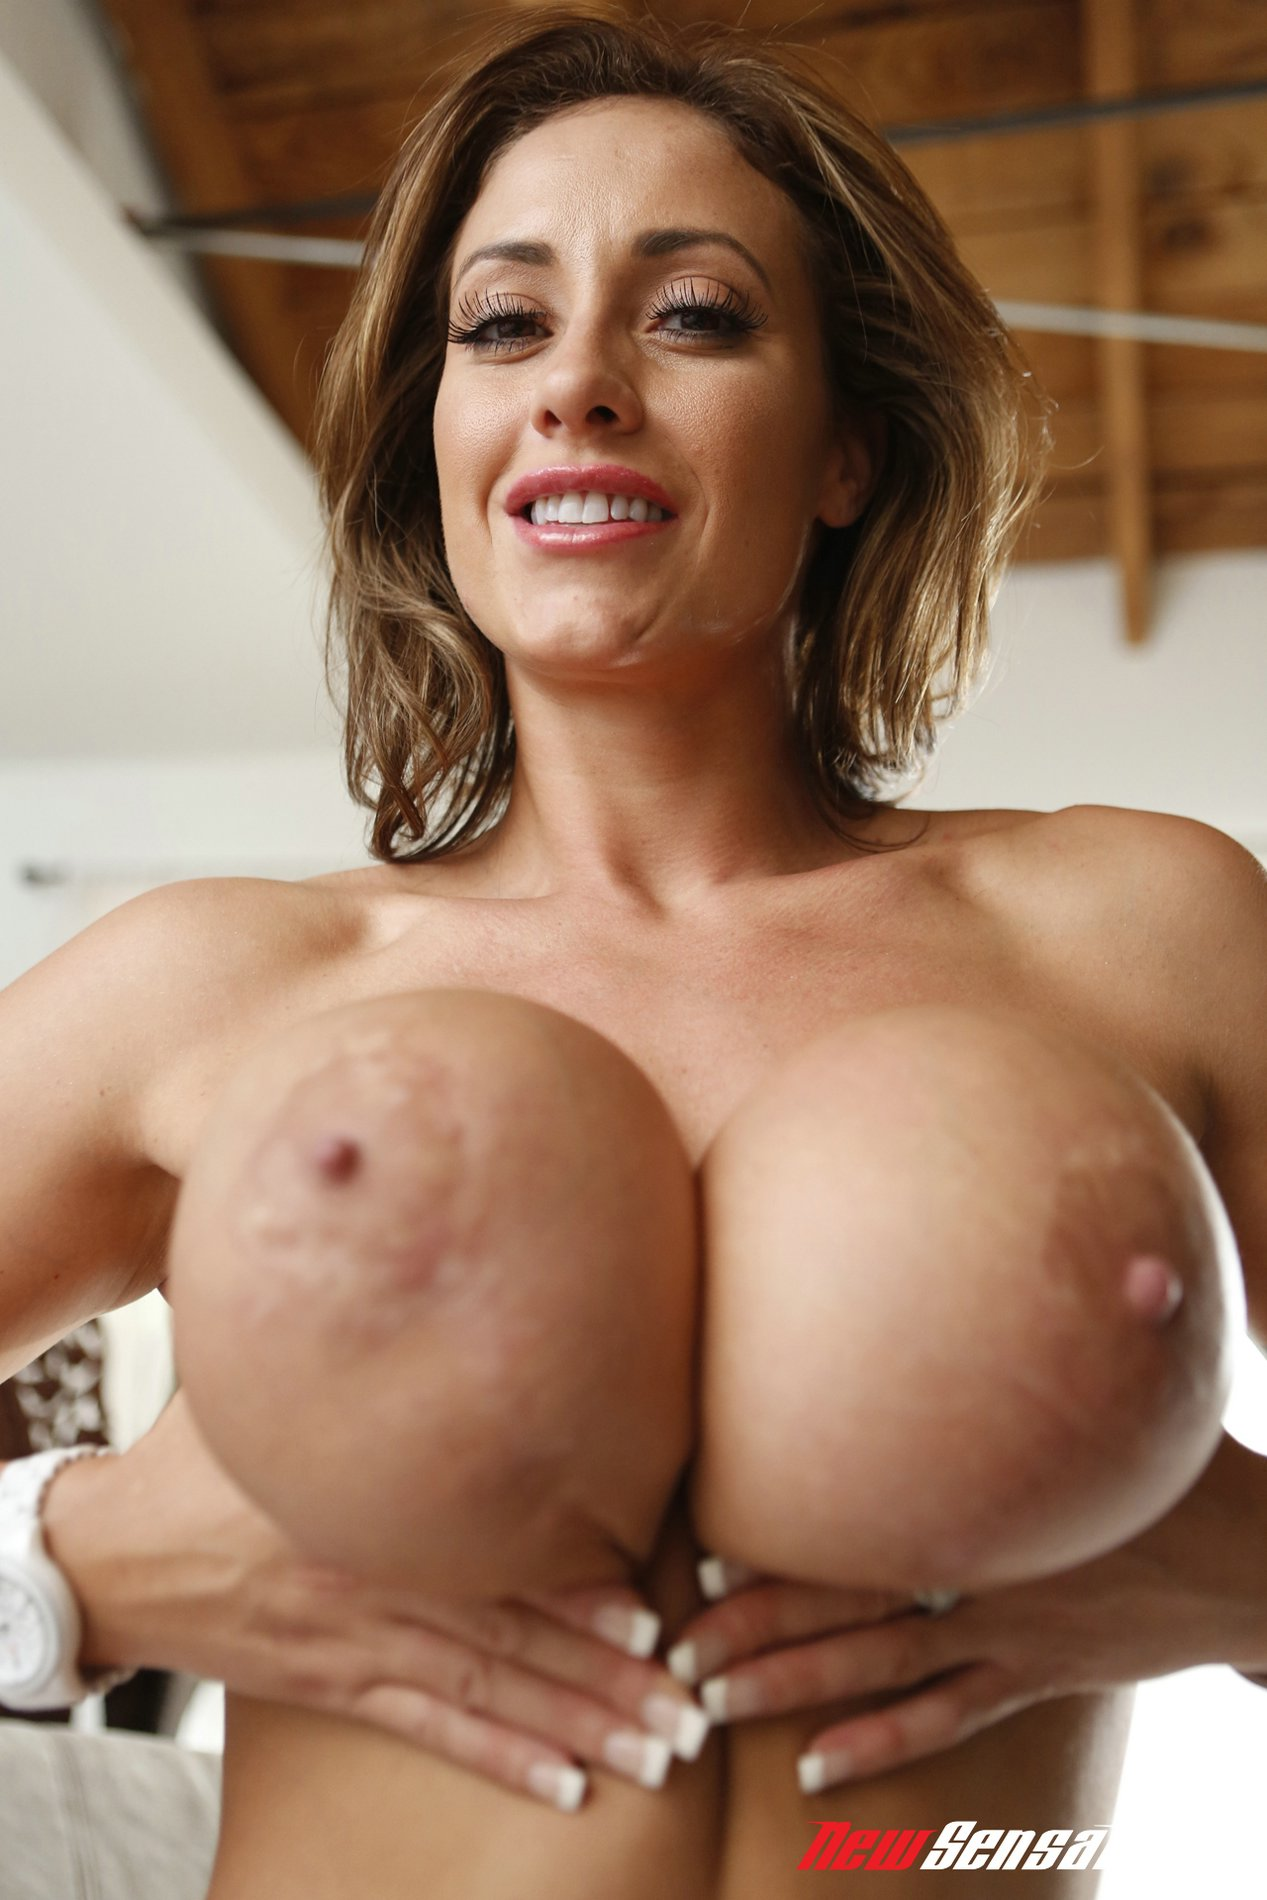 Eva notty has massive juicy boobs porn pic